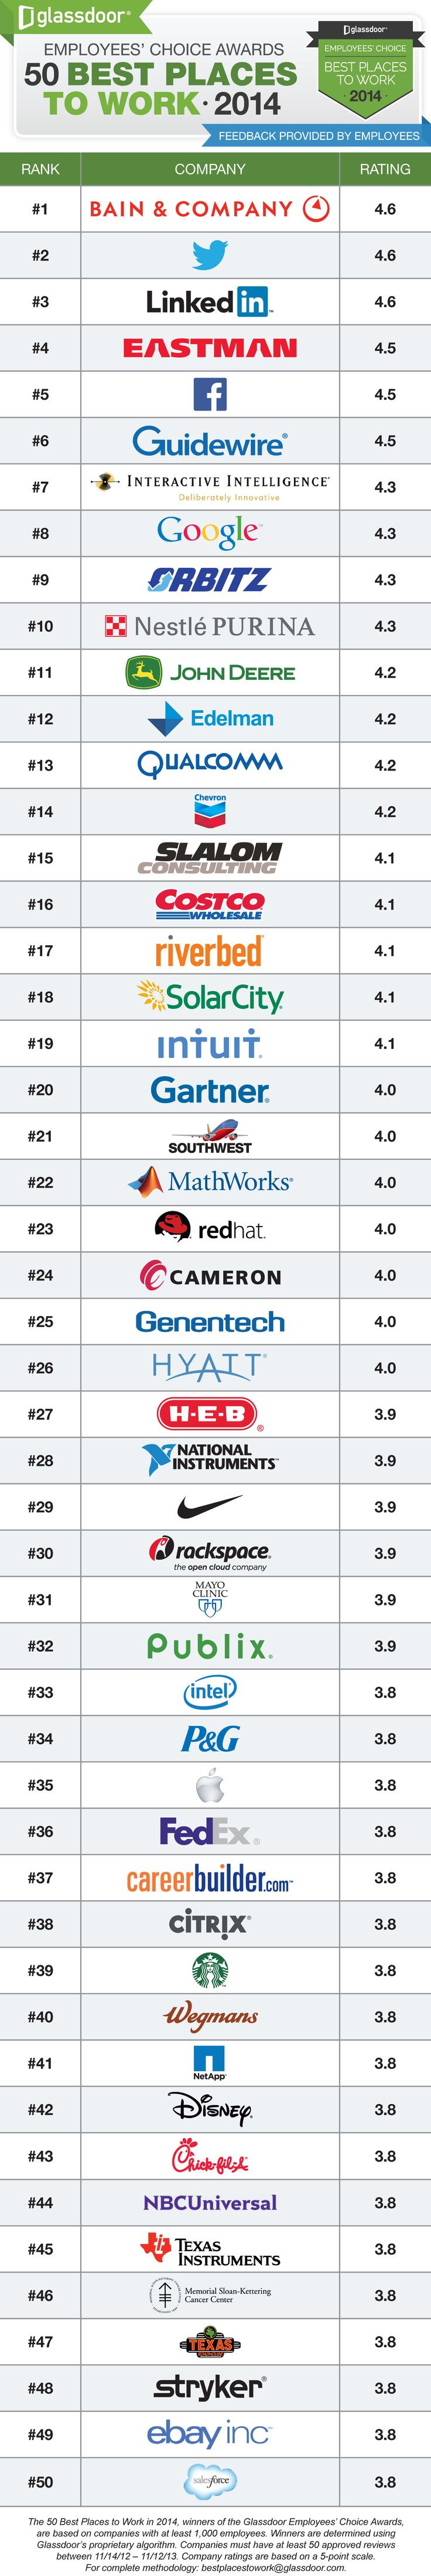 Glassdoor 50 Best Places to Work 2014 Glassdoor: Twitter dethrones Facebook as the best tech company to work for, ending three year streak